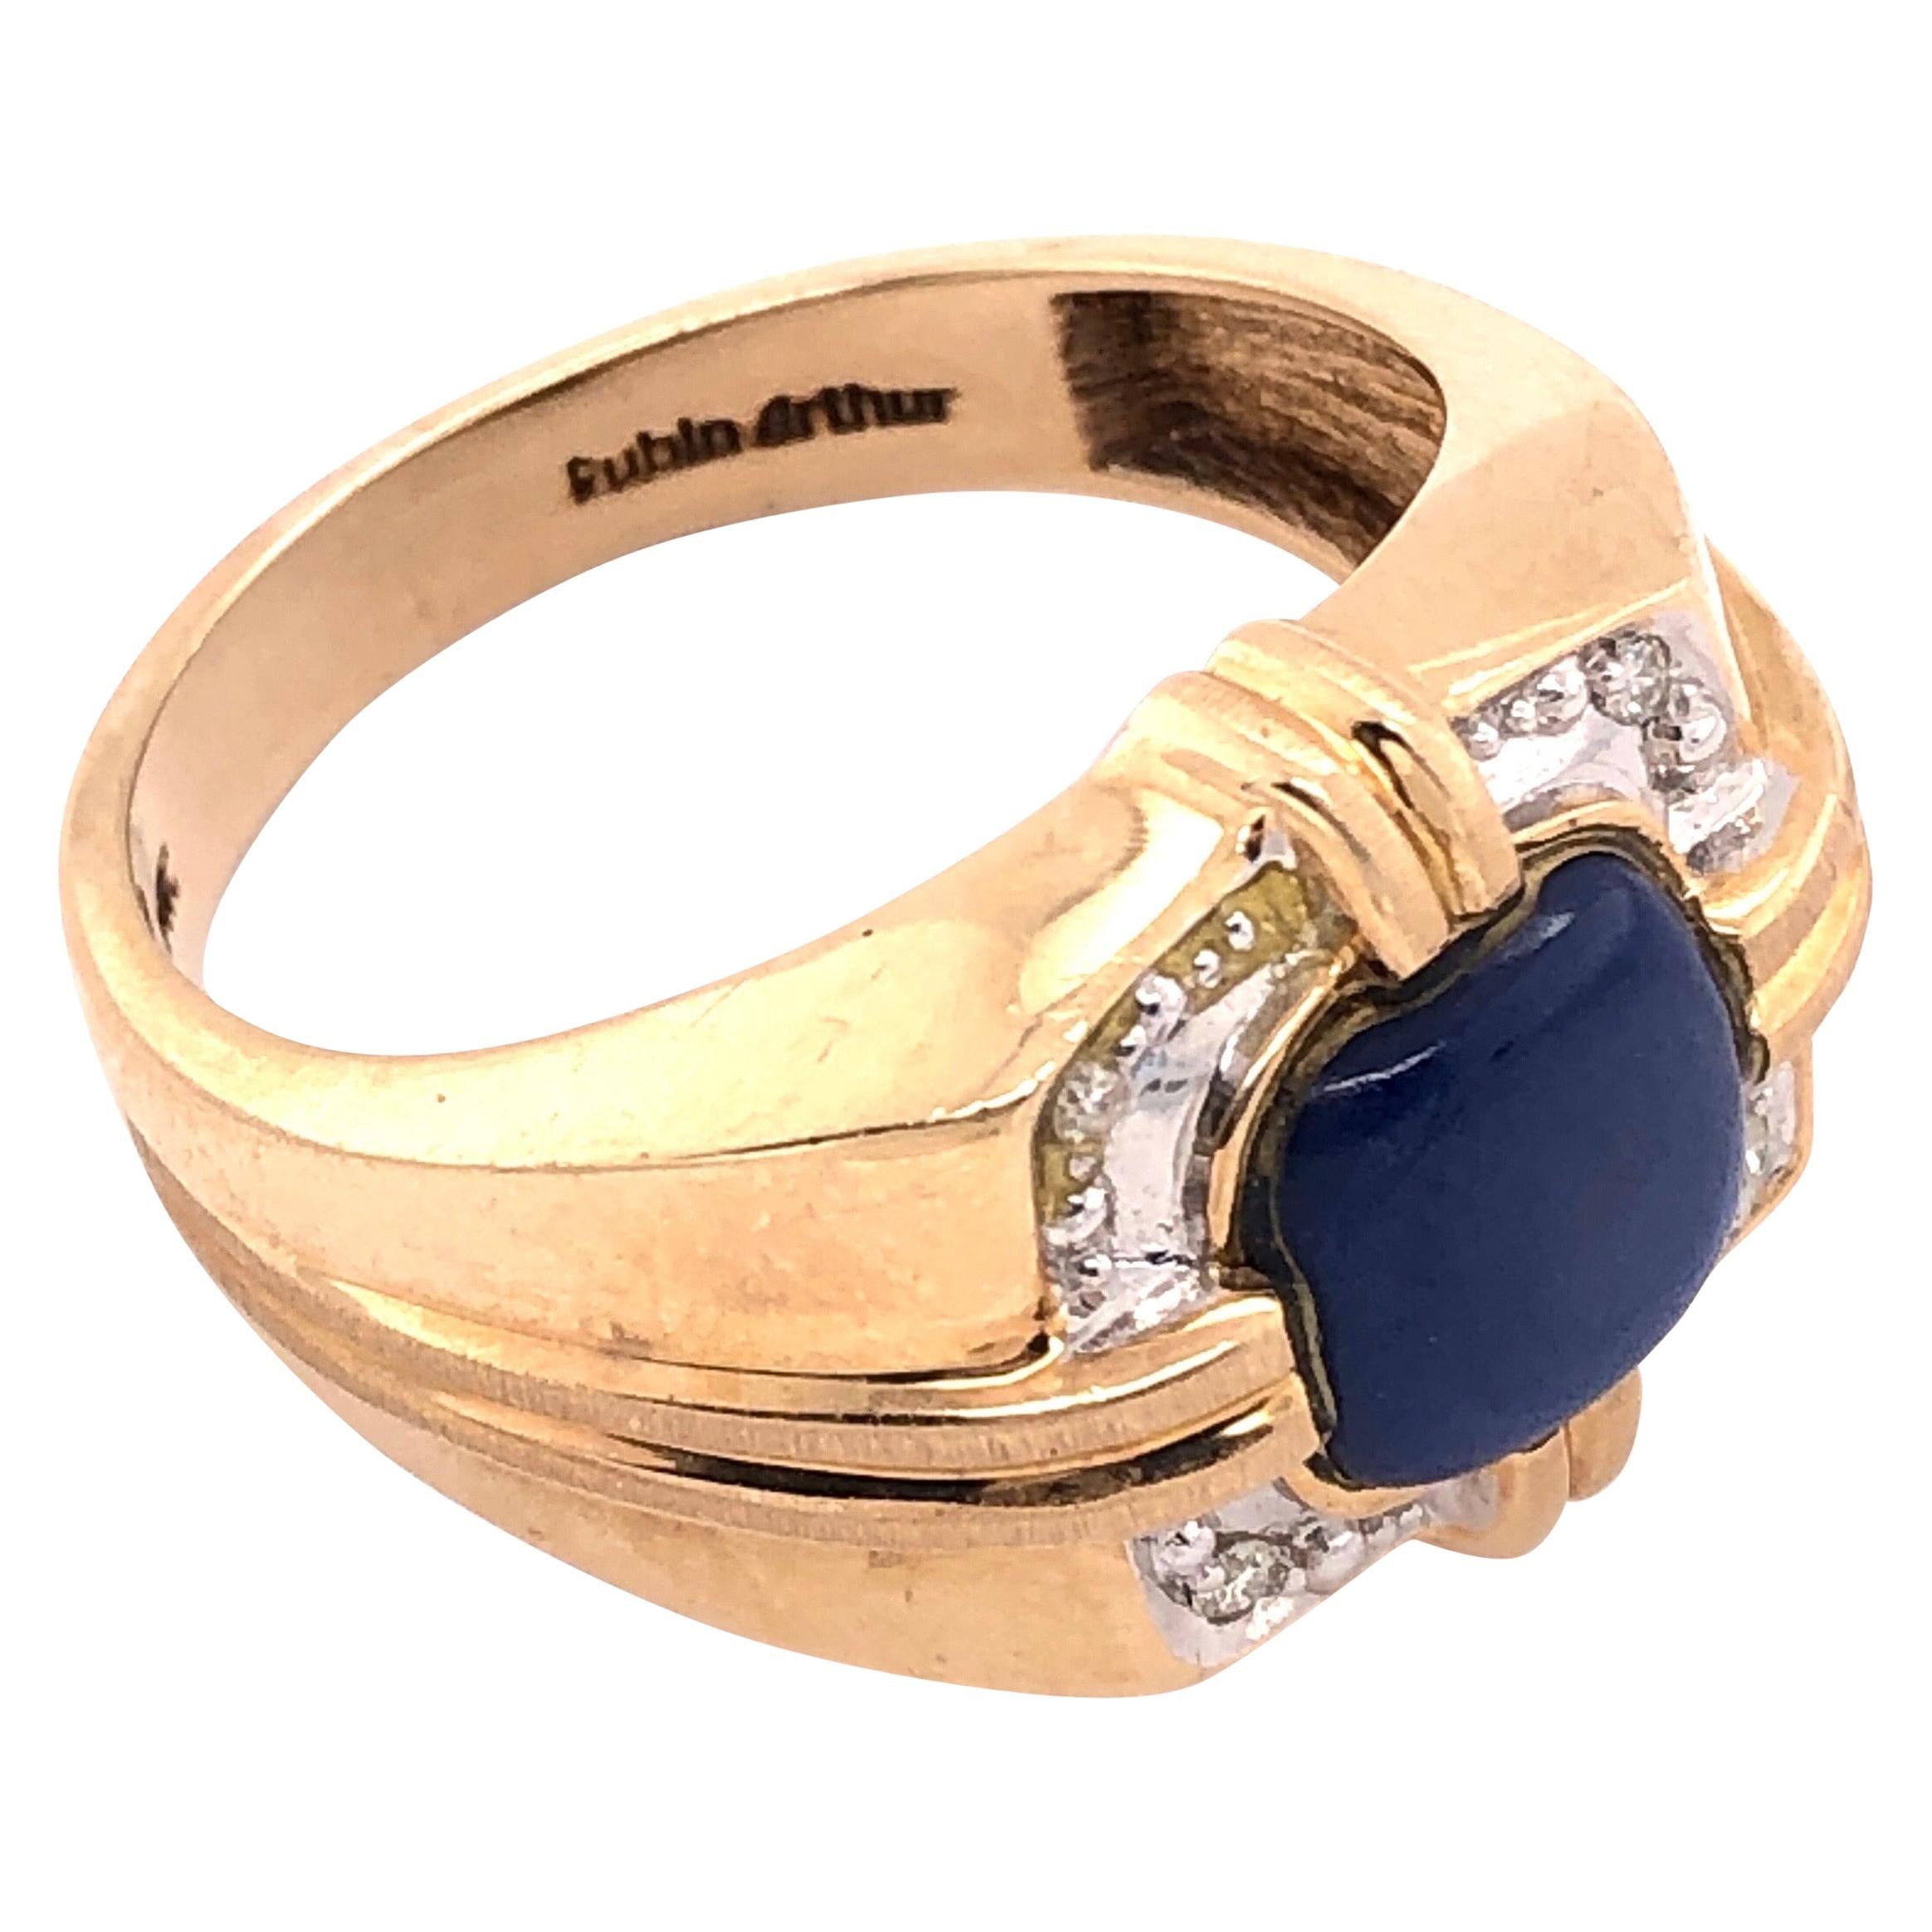 14 Karat Yellow Gold Contemporary Ring with Diamonds